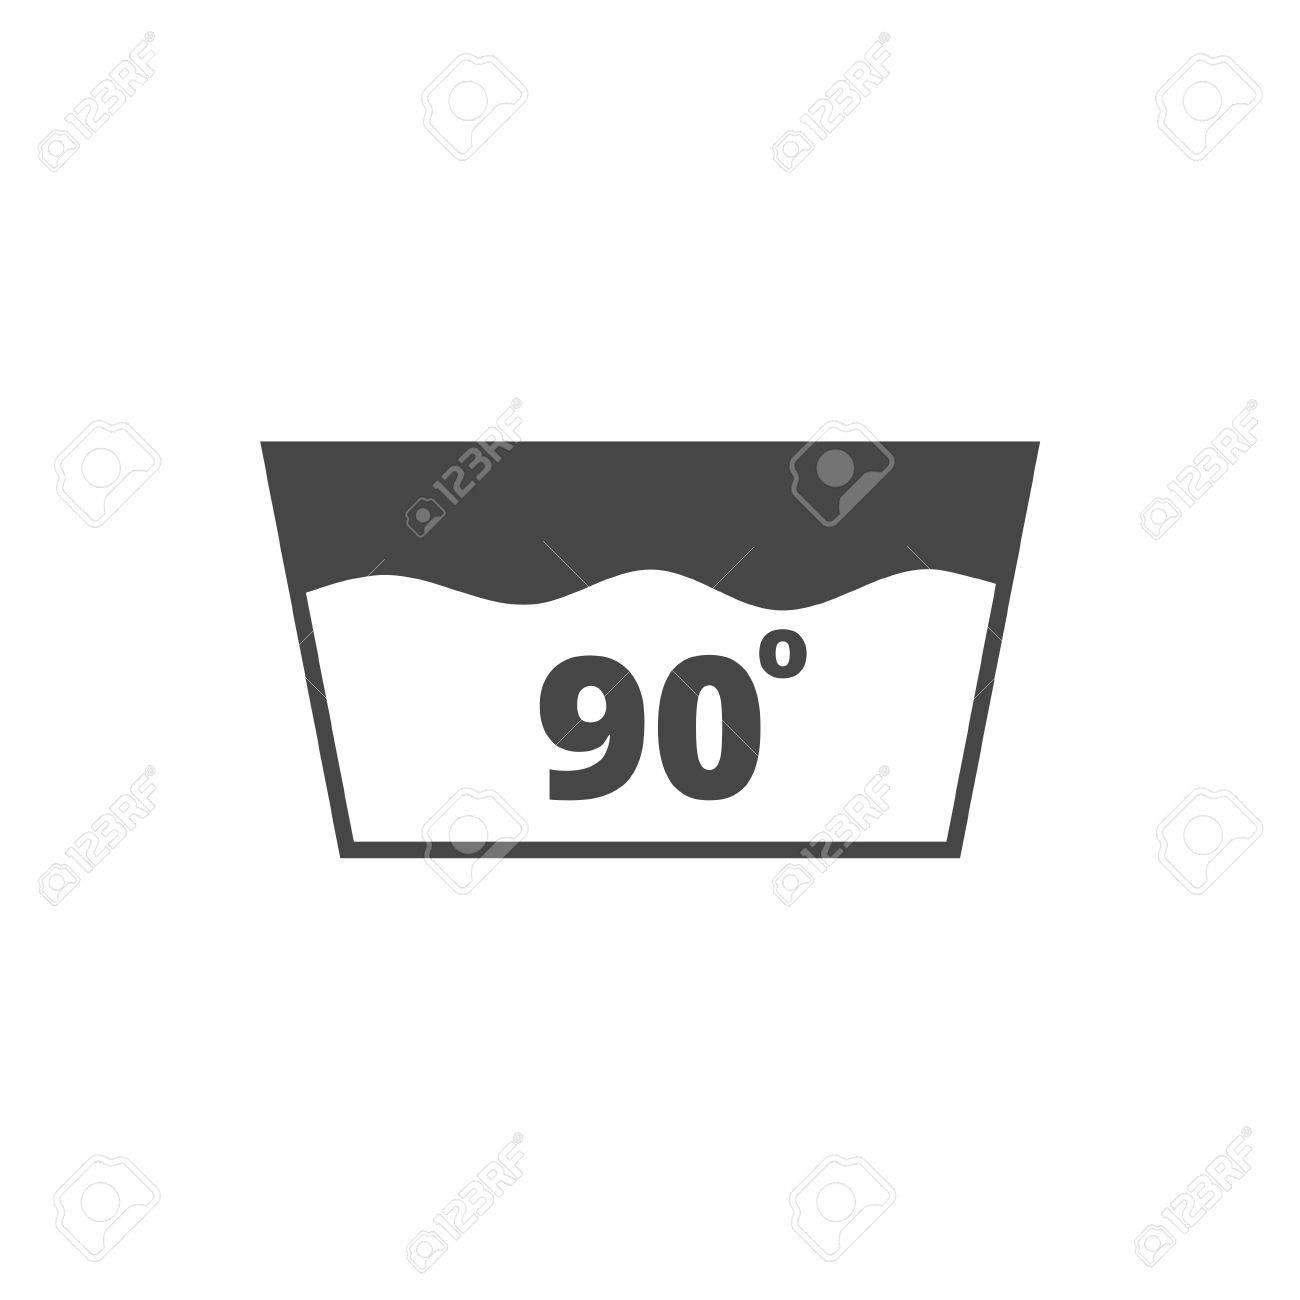 Wash Icon Machine Washable At 90 Degrees Symbol Royalty Free